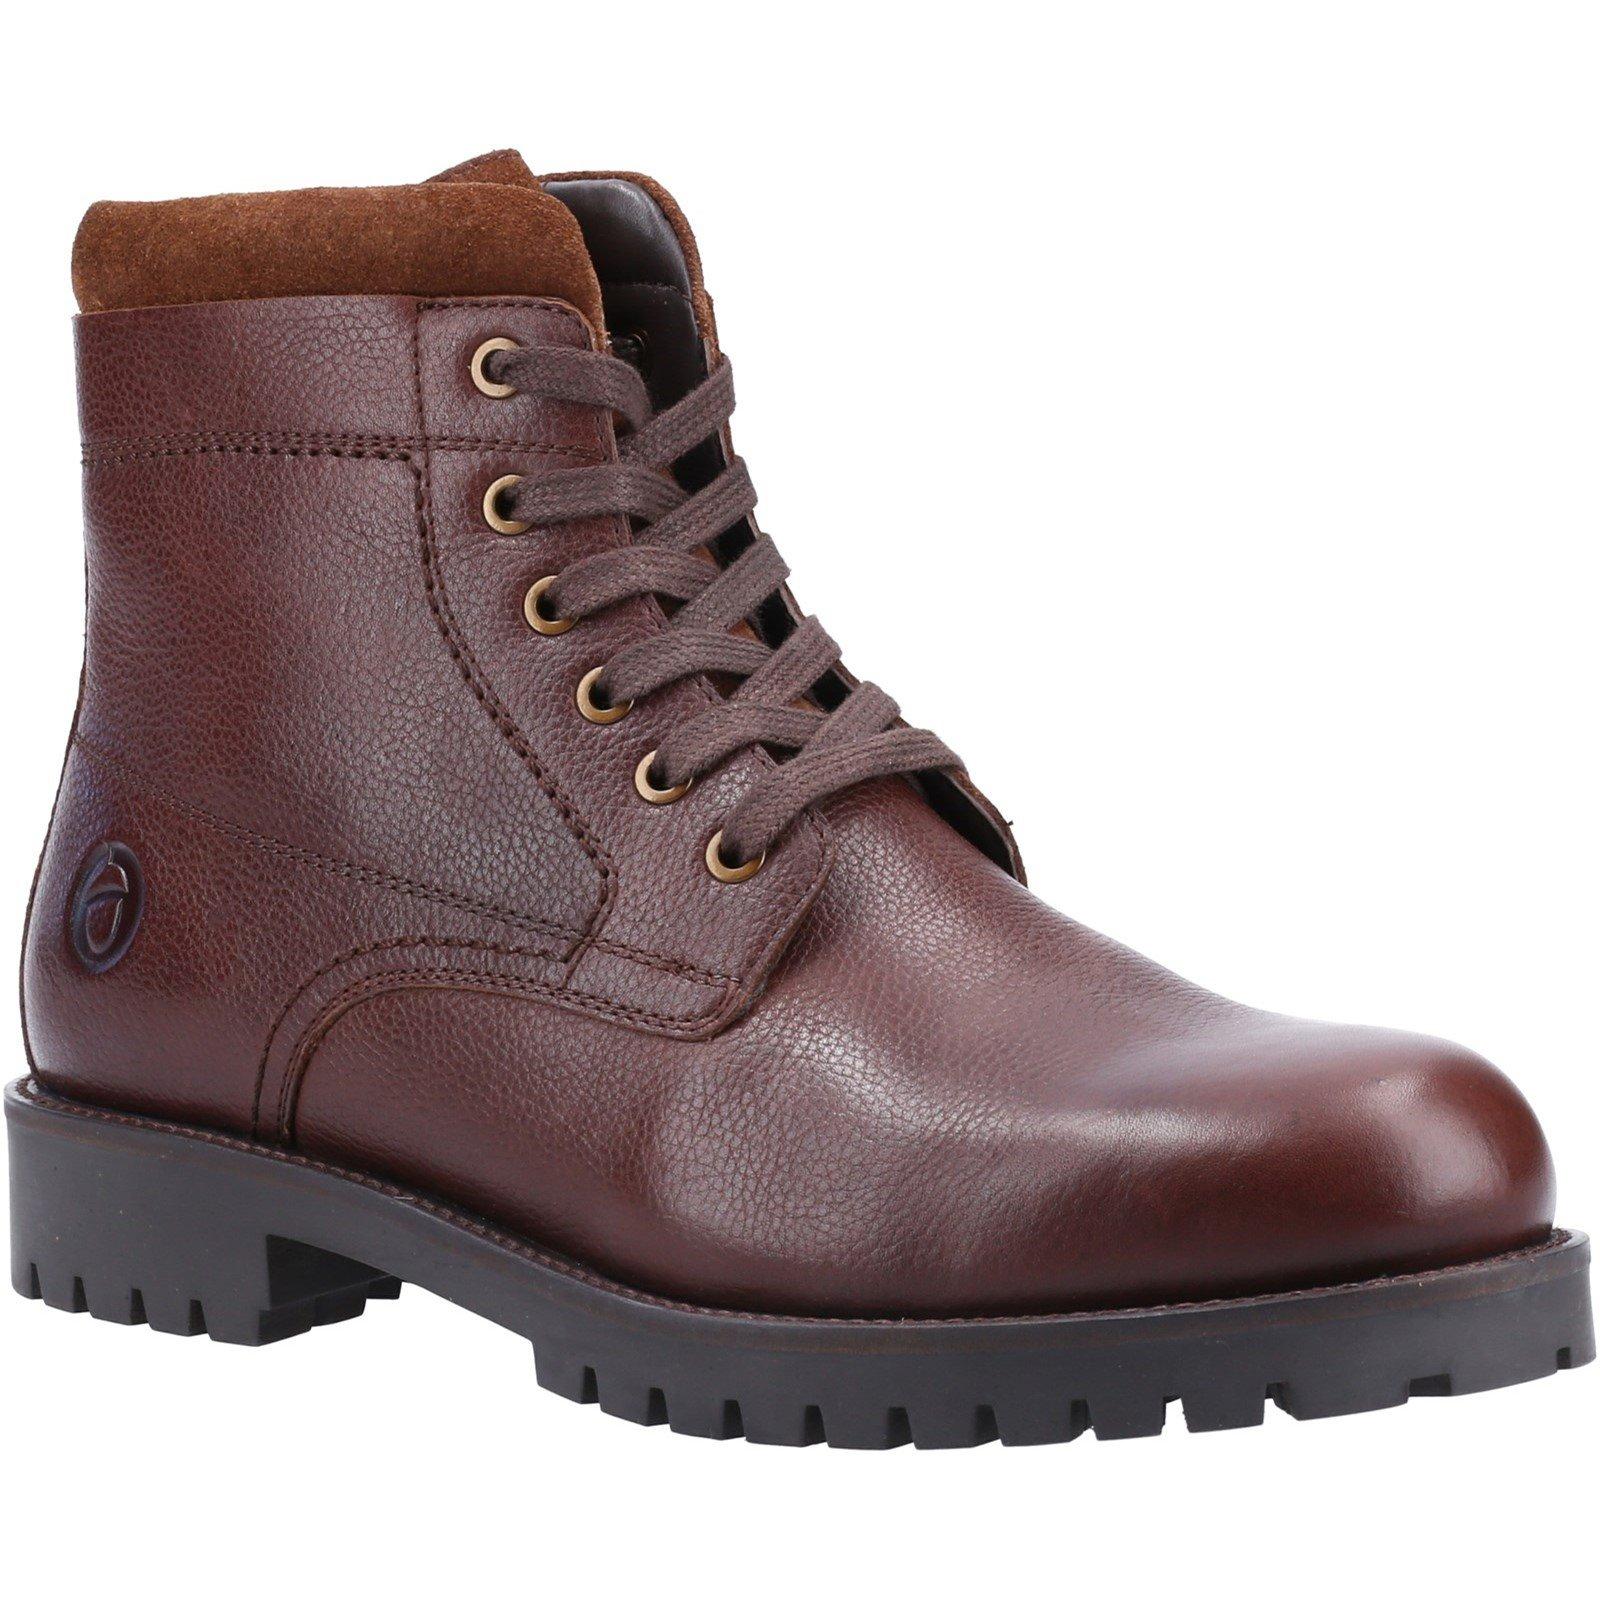 Cotswold Men's Thorsbury Lace Up Shoe Boot Various Colours 32963 - Brown 9